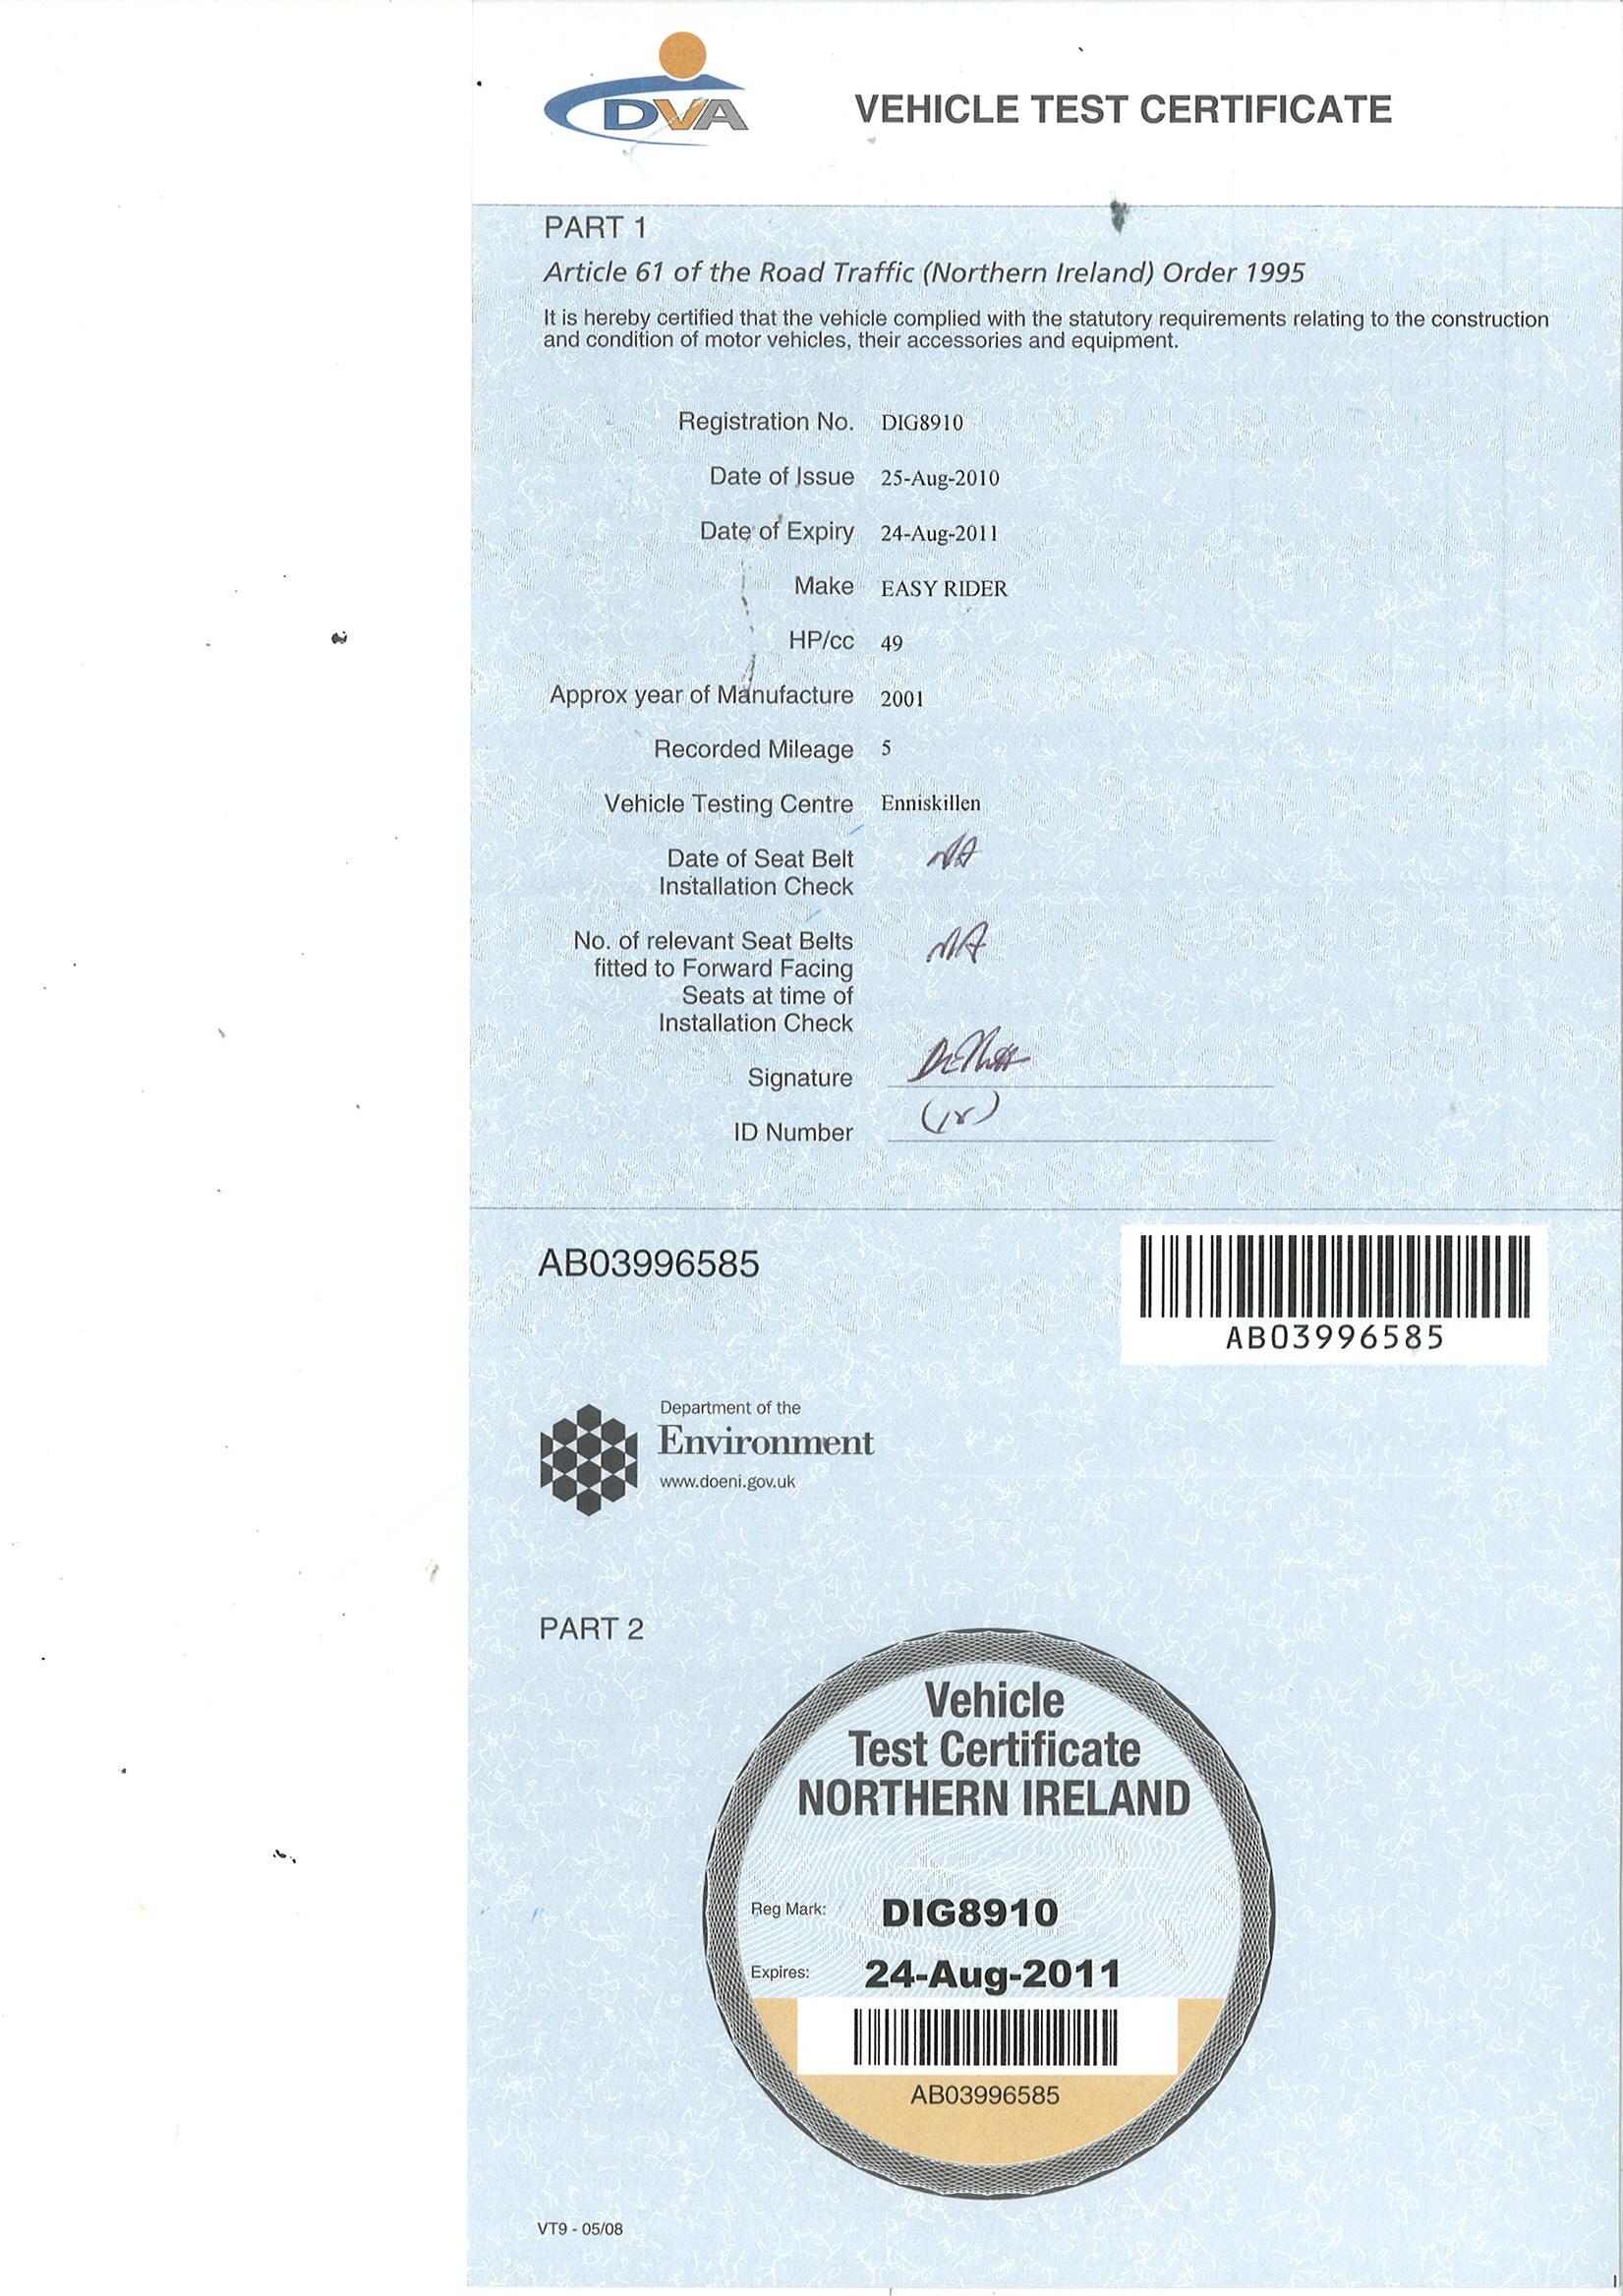 ni-mot-cert-_20101006144816_00001